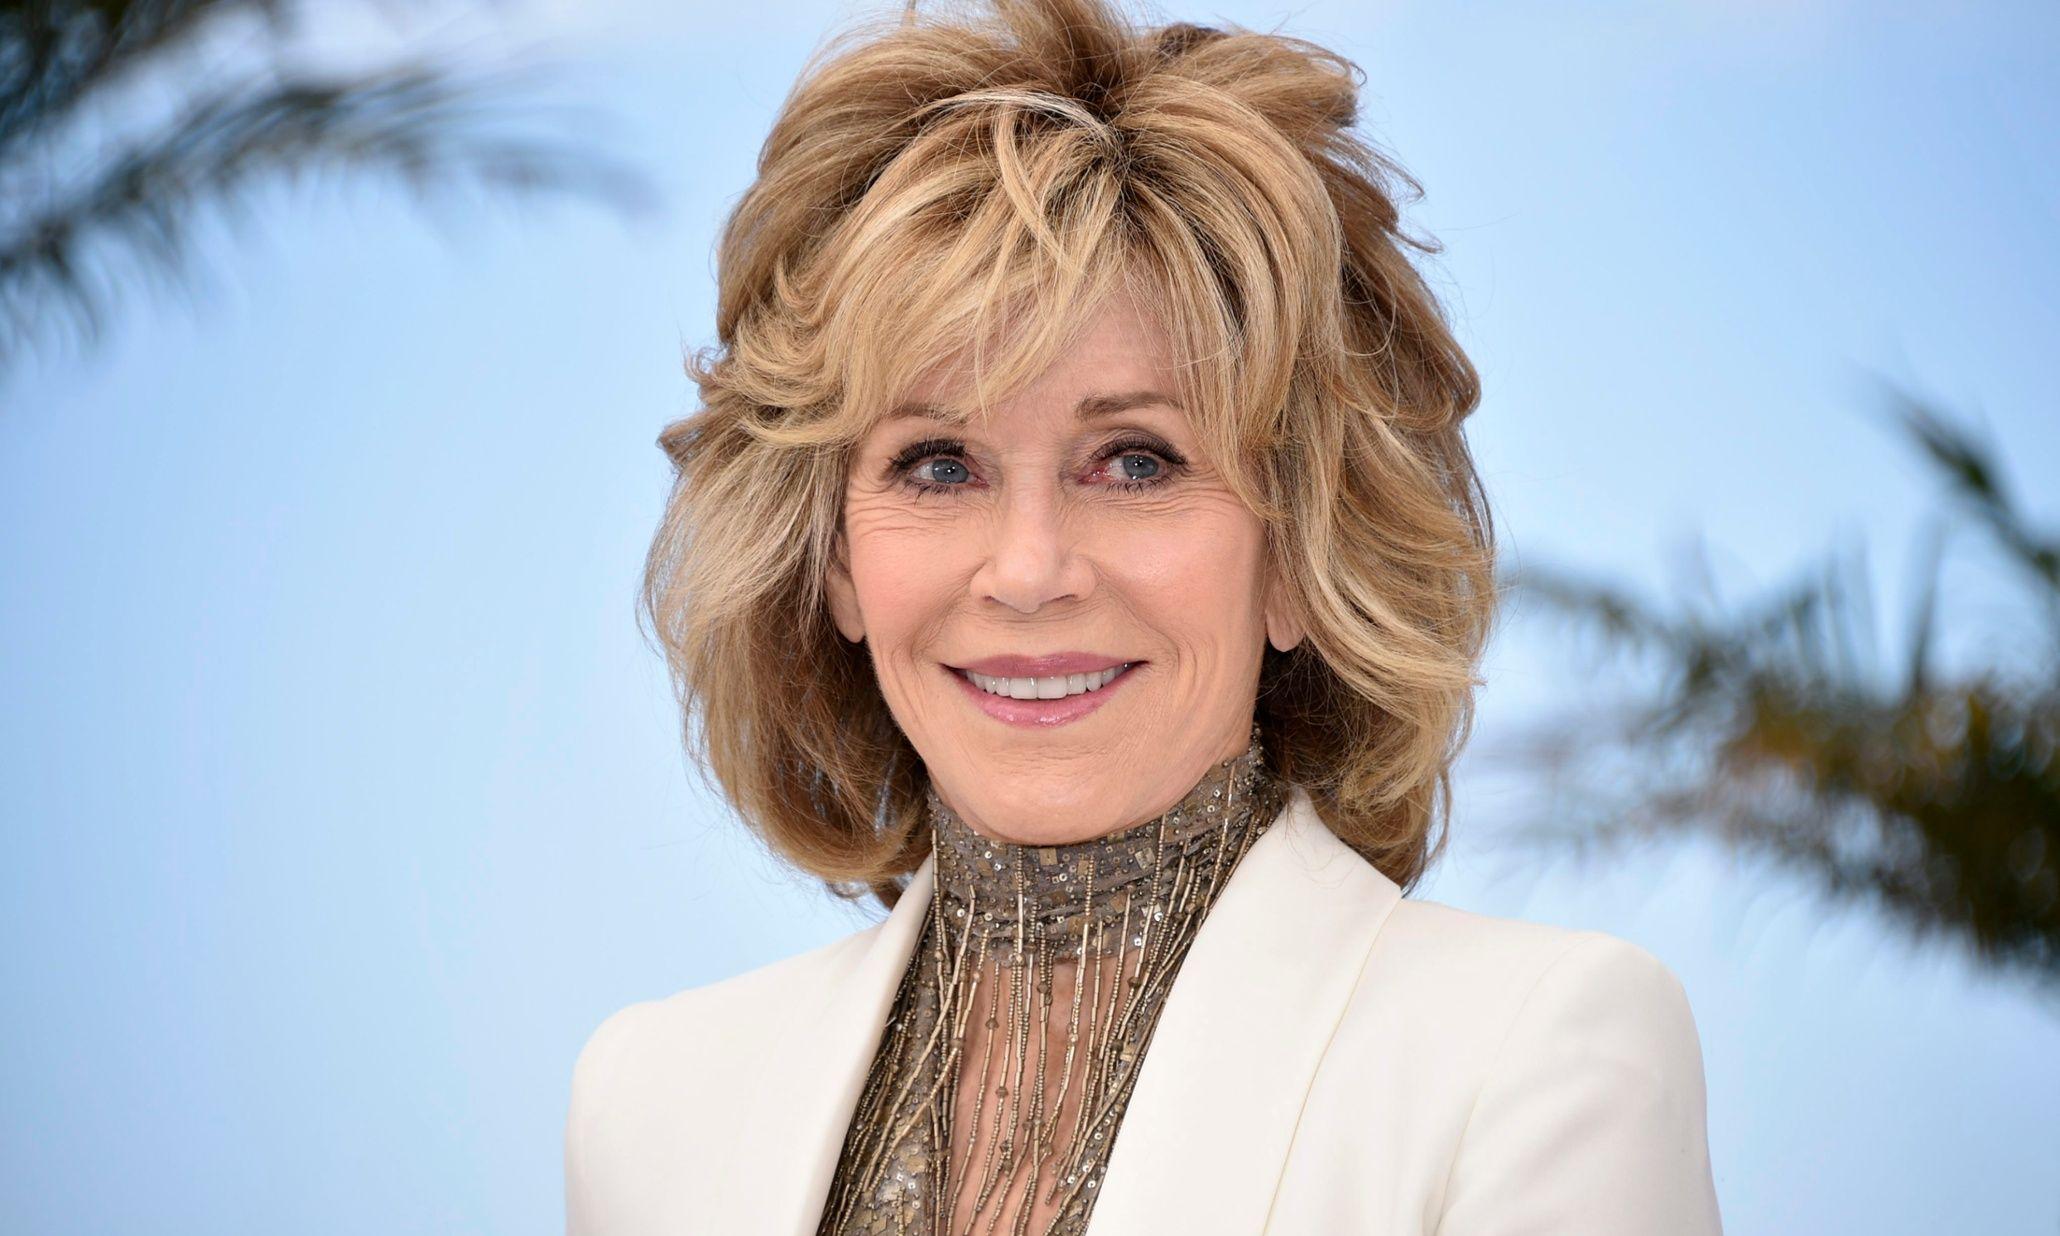 Jane Fonda Plastic surgery bought me a decade